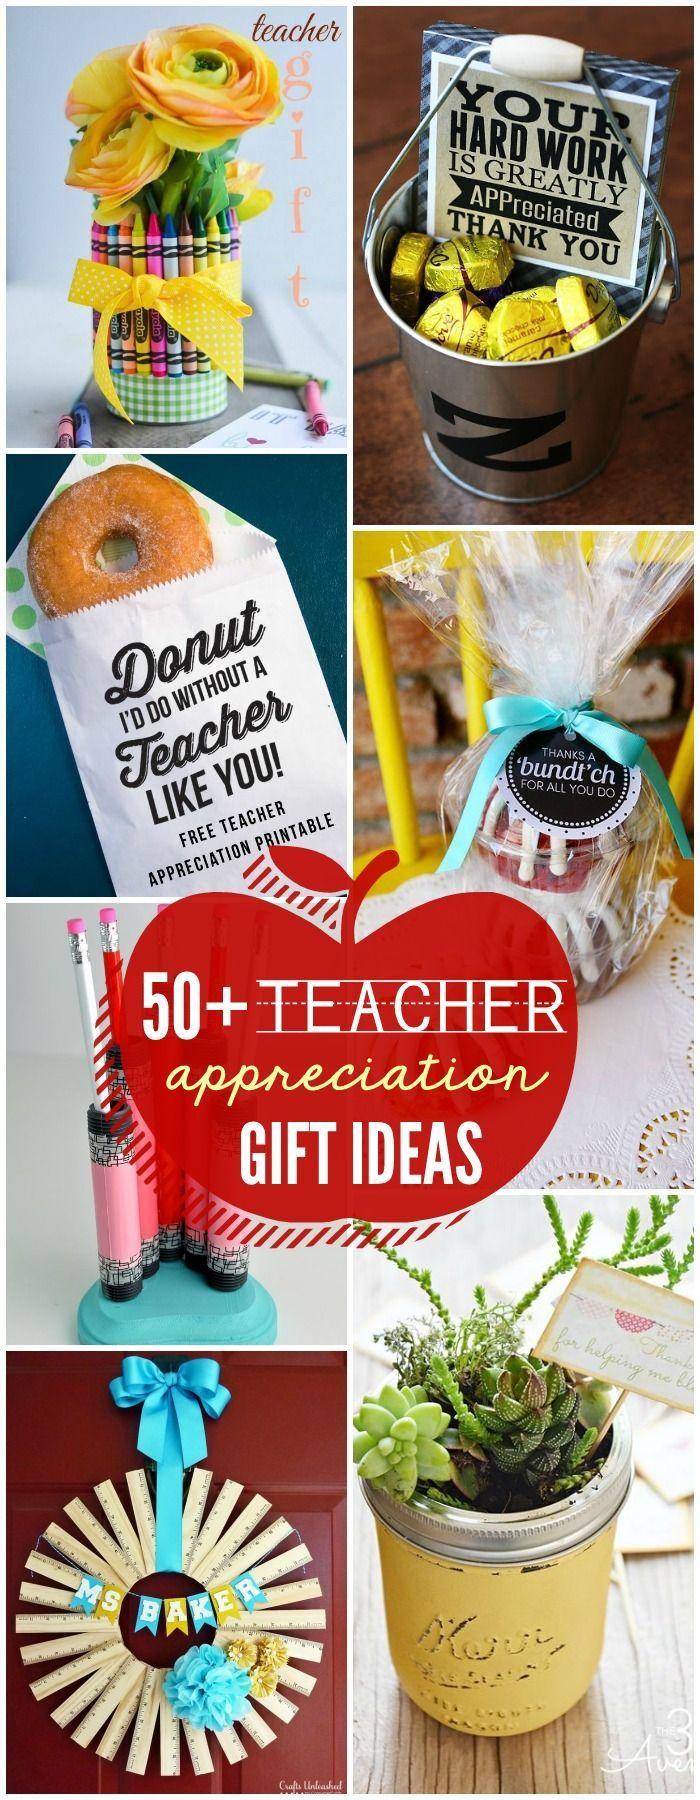 50+ Must-See Teacher Appreciate Gift Ideas on { lilluna.com }